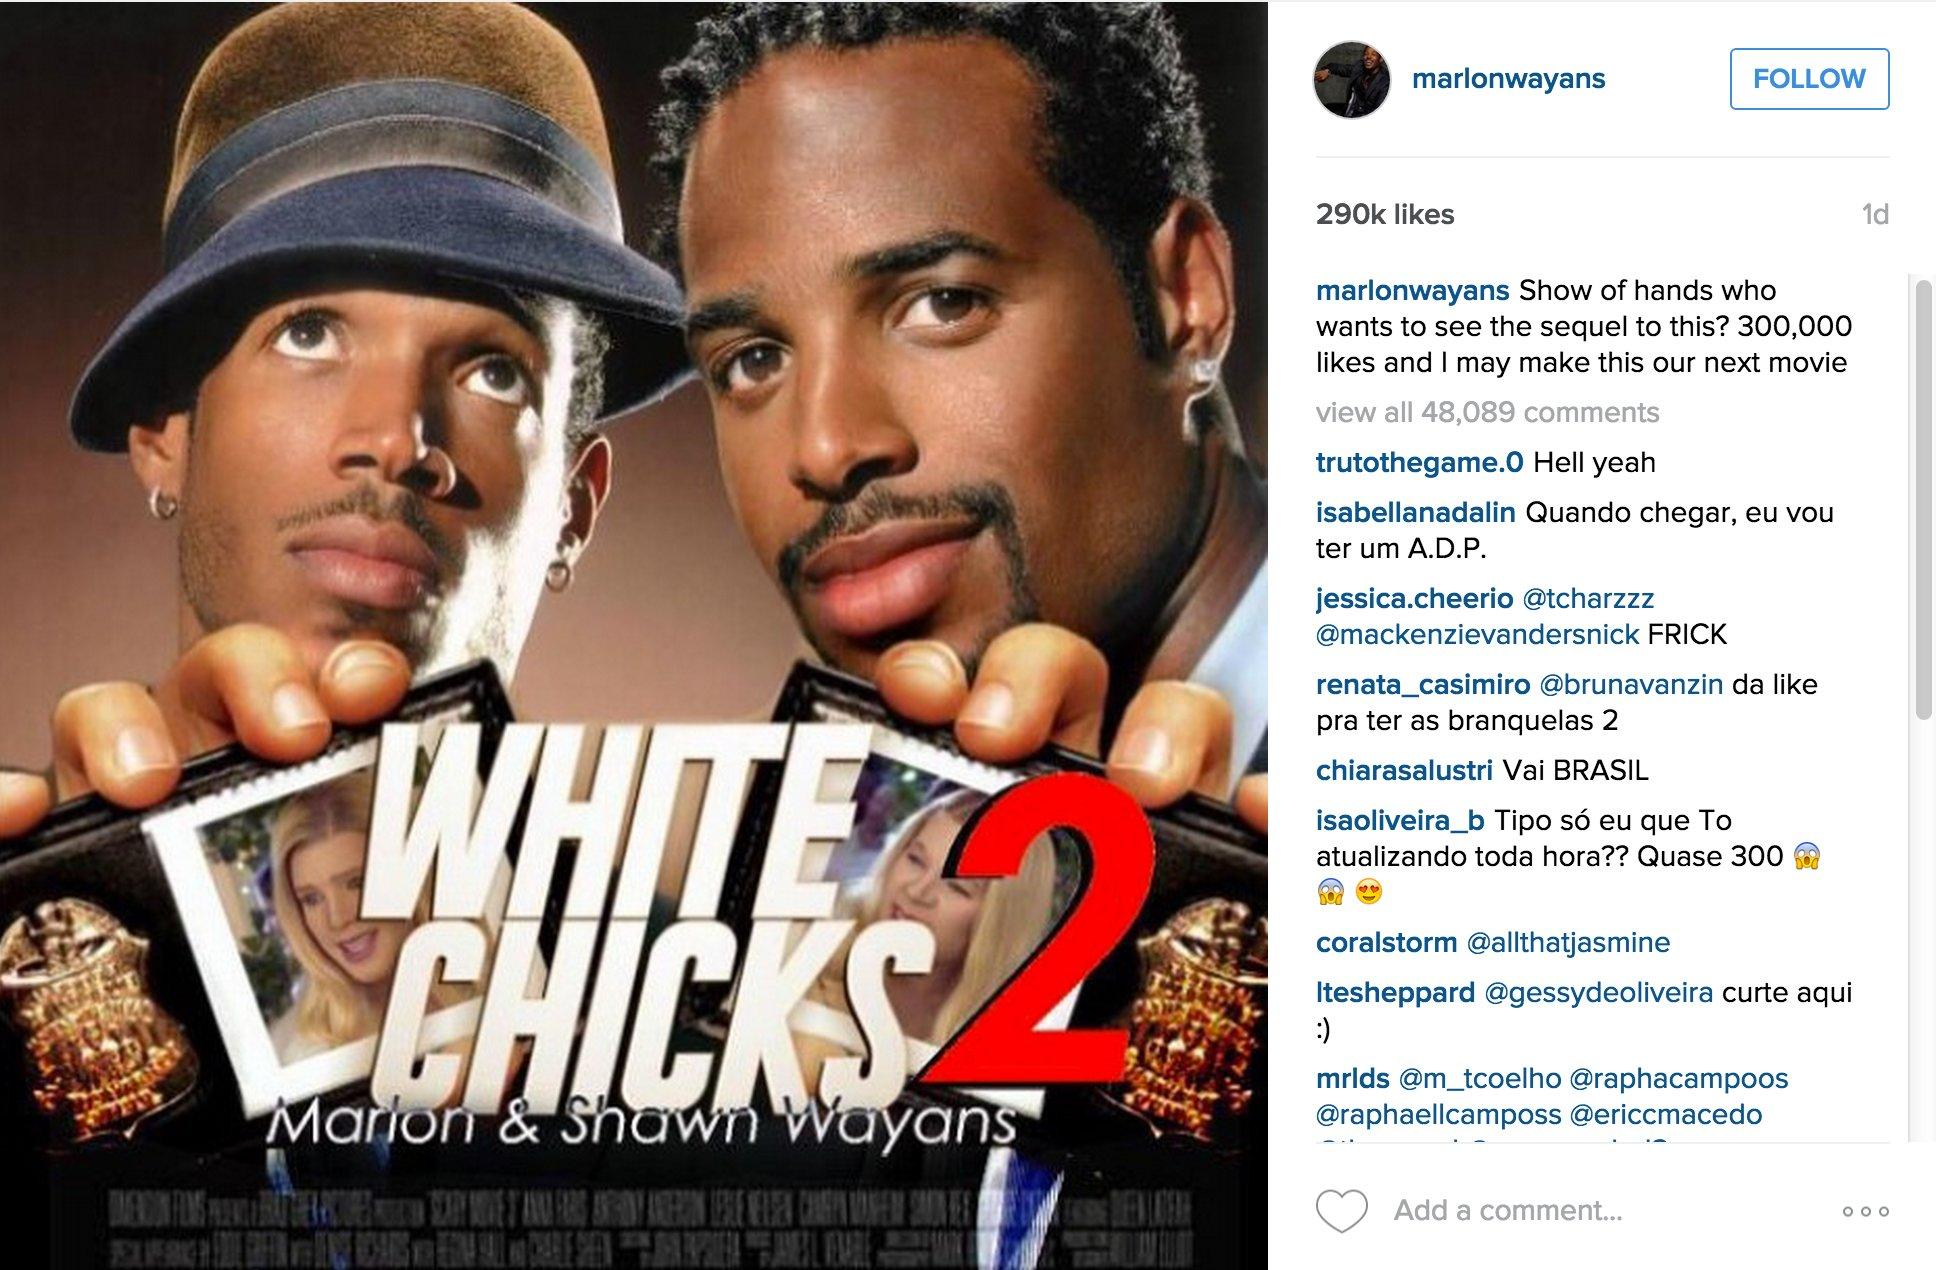 White chicks date